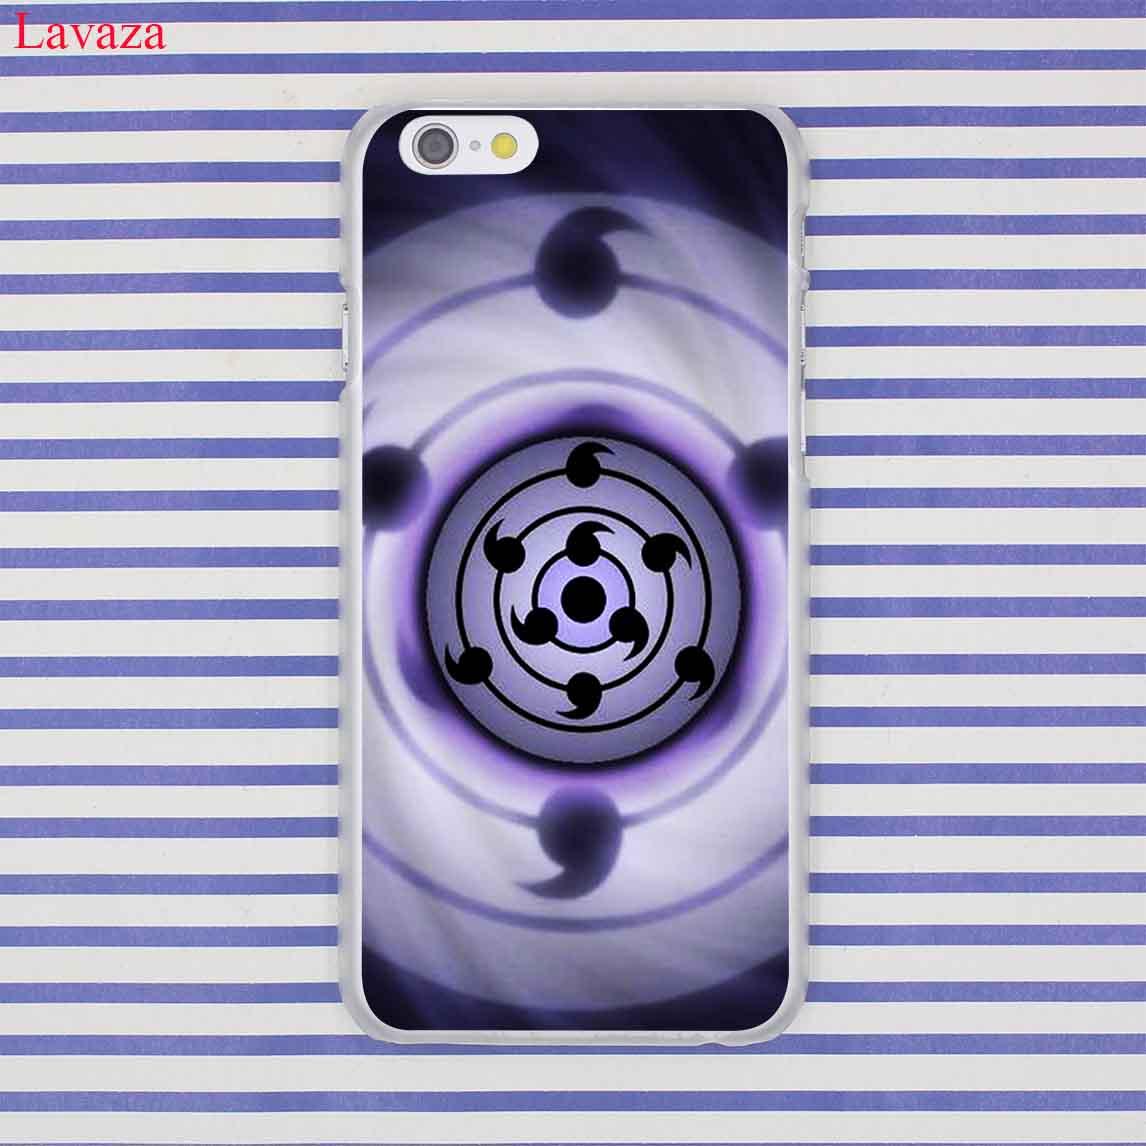 Lavaza Pain Pain Hokage Naruto Kakashi shippuden rinnegan Hard Phone Case for Apple iPhone 8 7 6